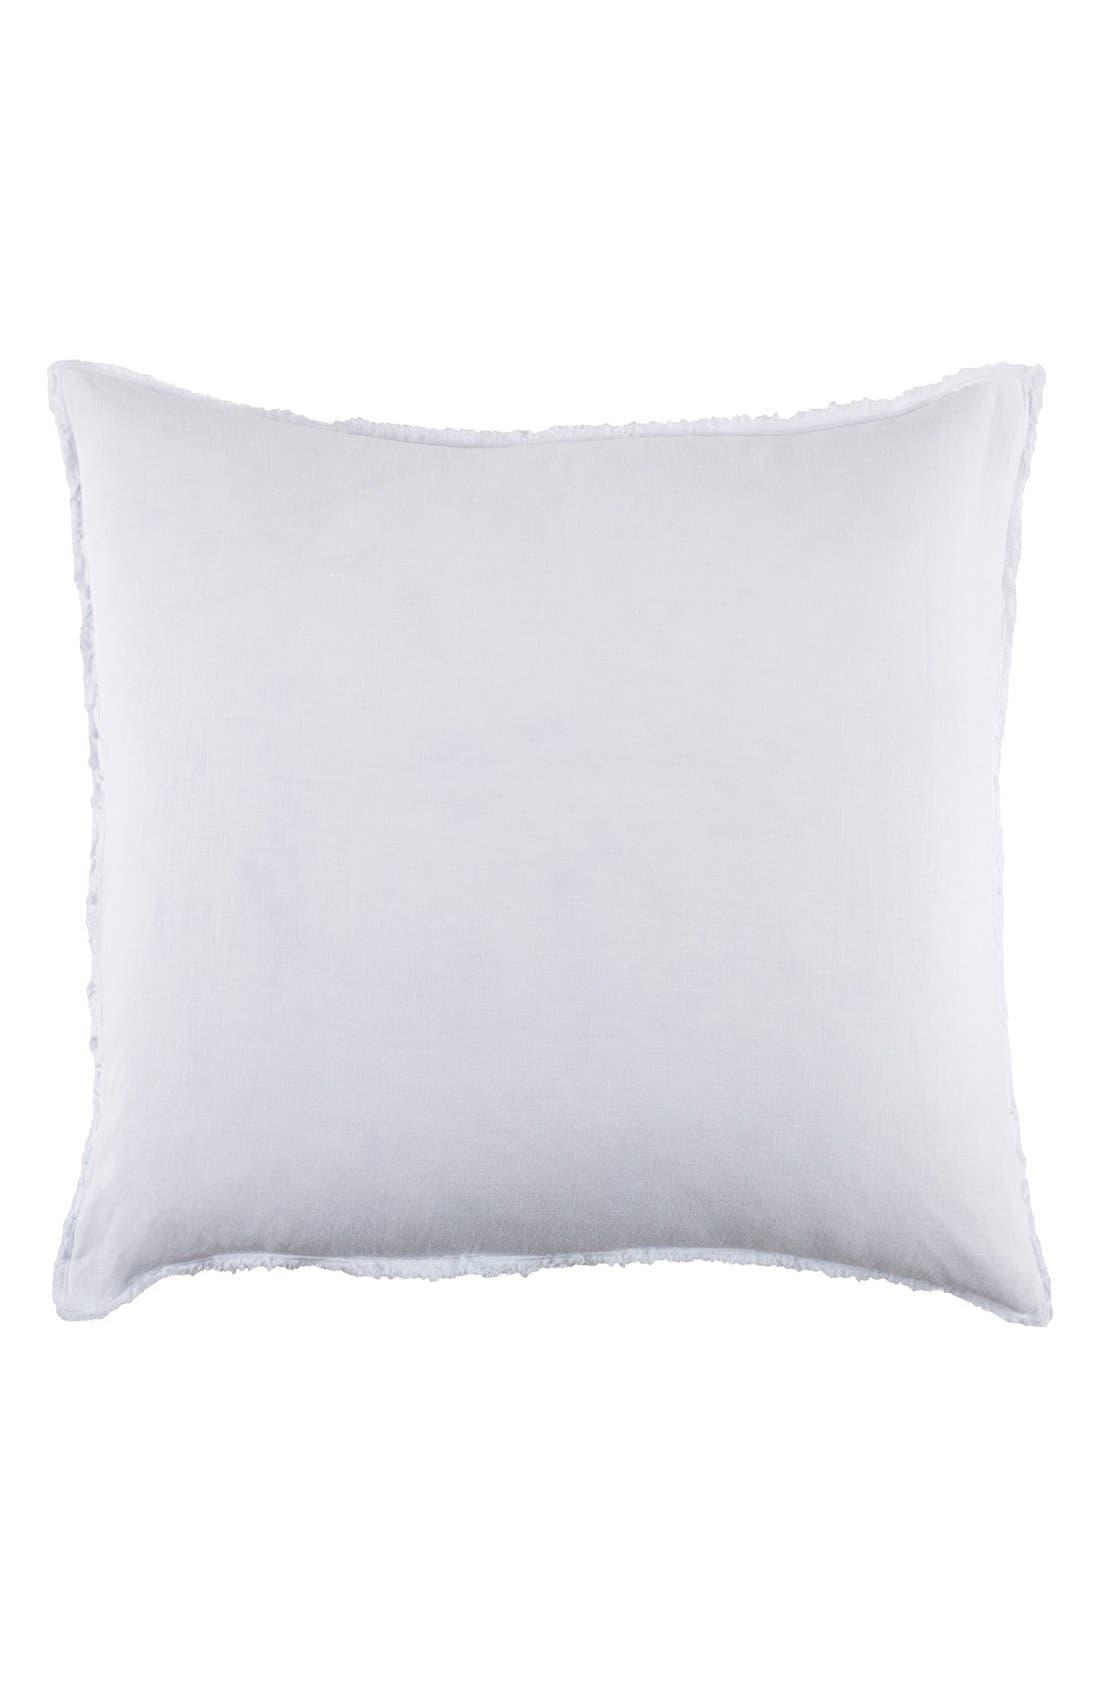 'Blair' Linen Euro Pillow Sham,                             Main thumbnail 1, color,                             WHITE